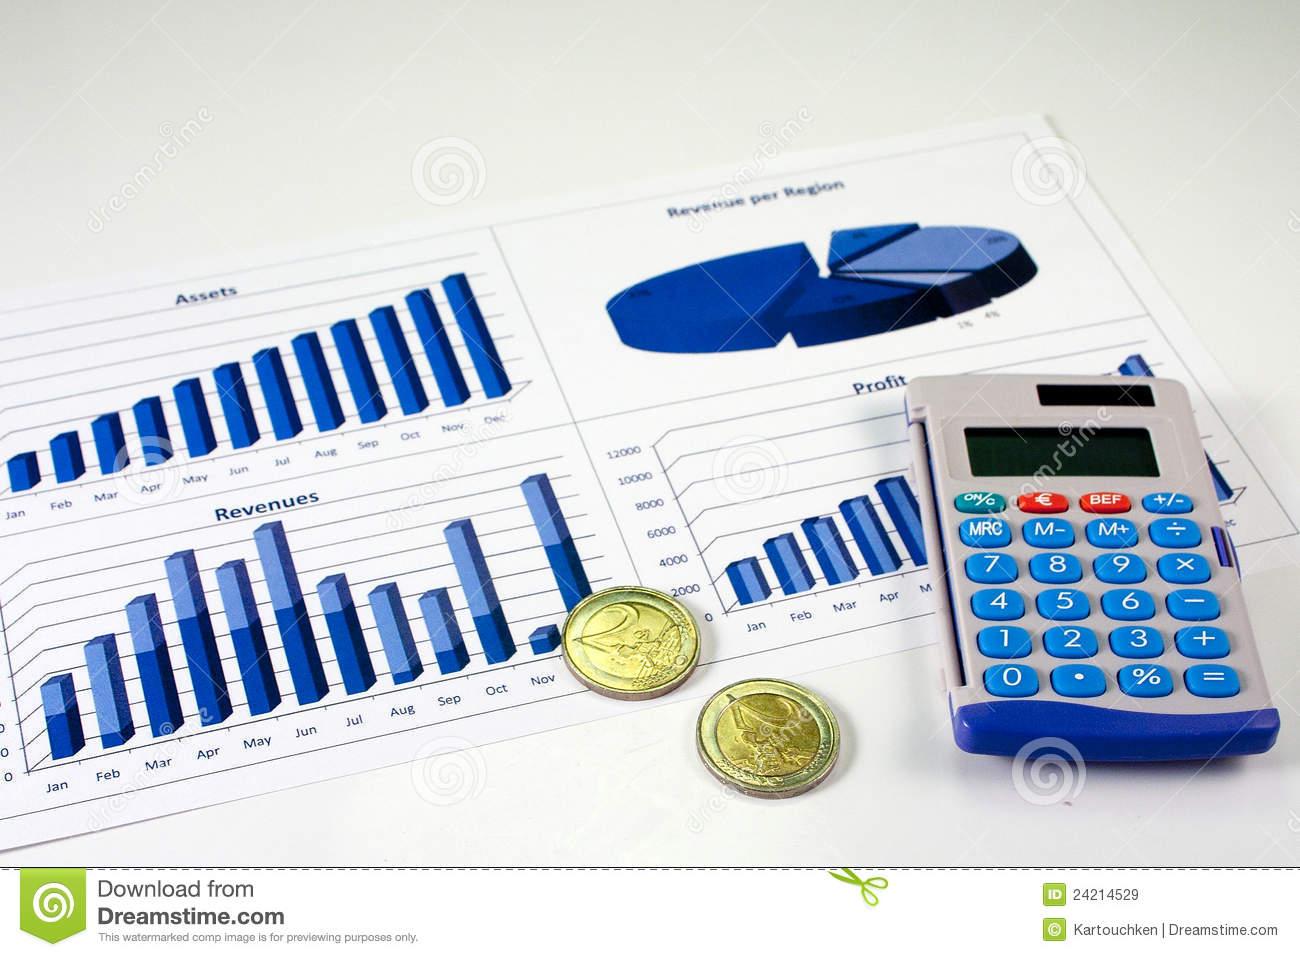 Calculator clipart finance. Financial management station